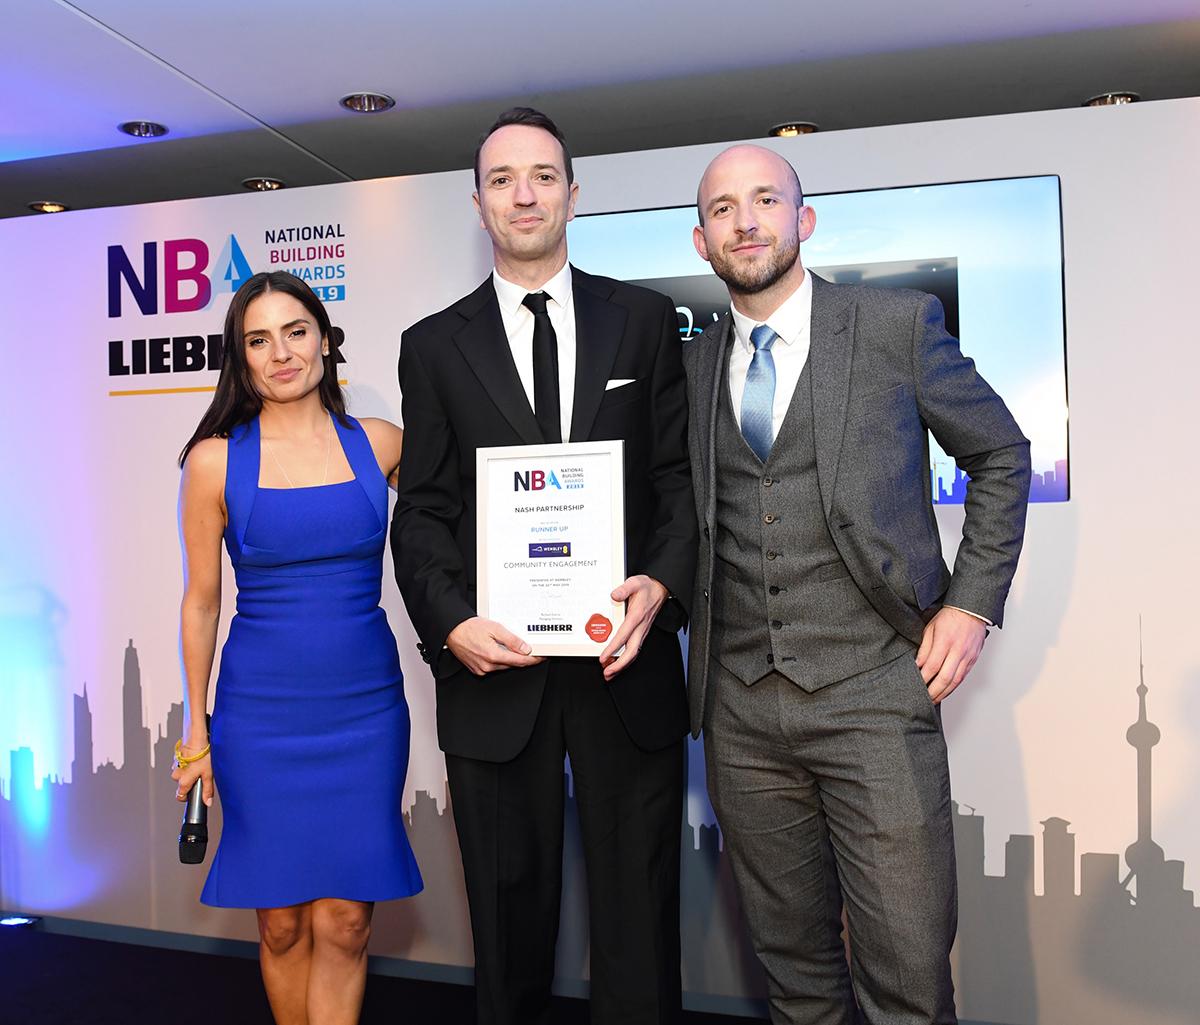 nba awards 2019 - photo #14